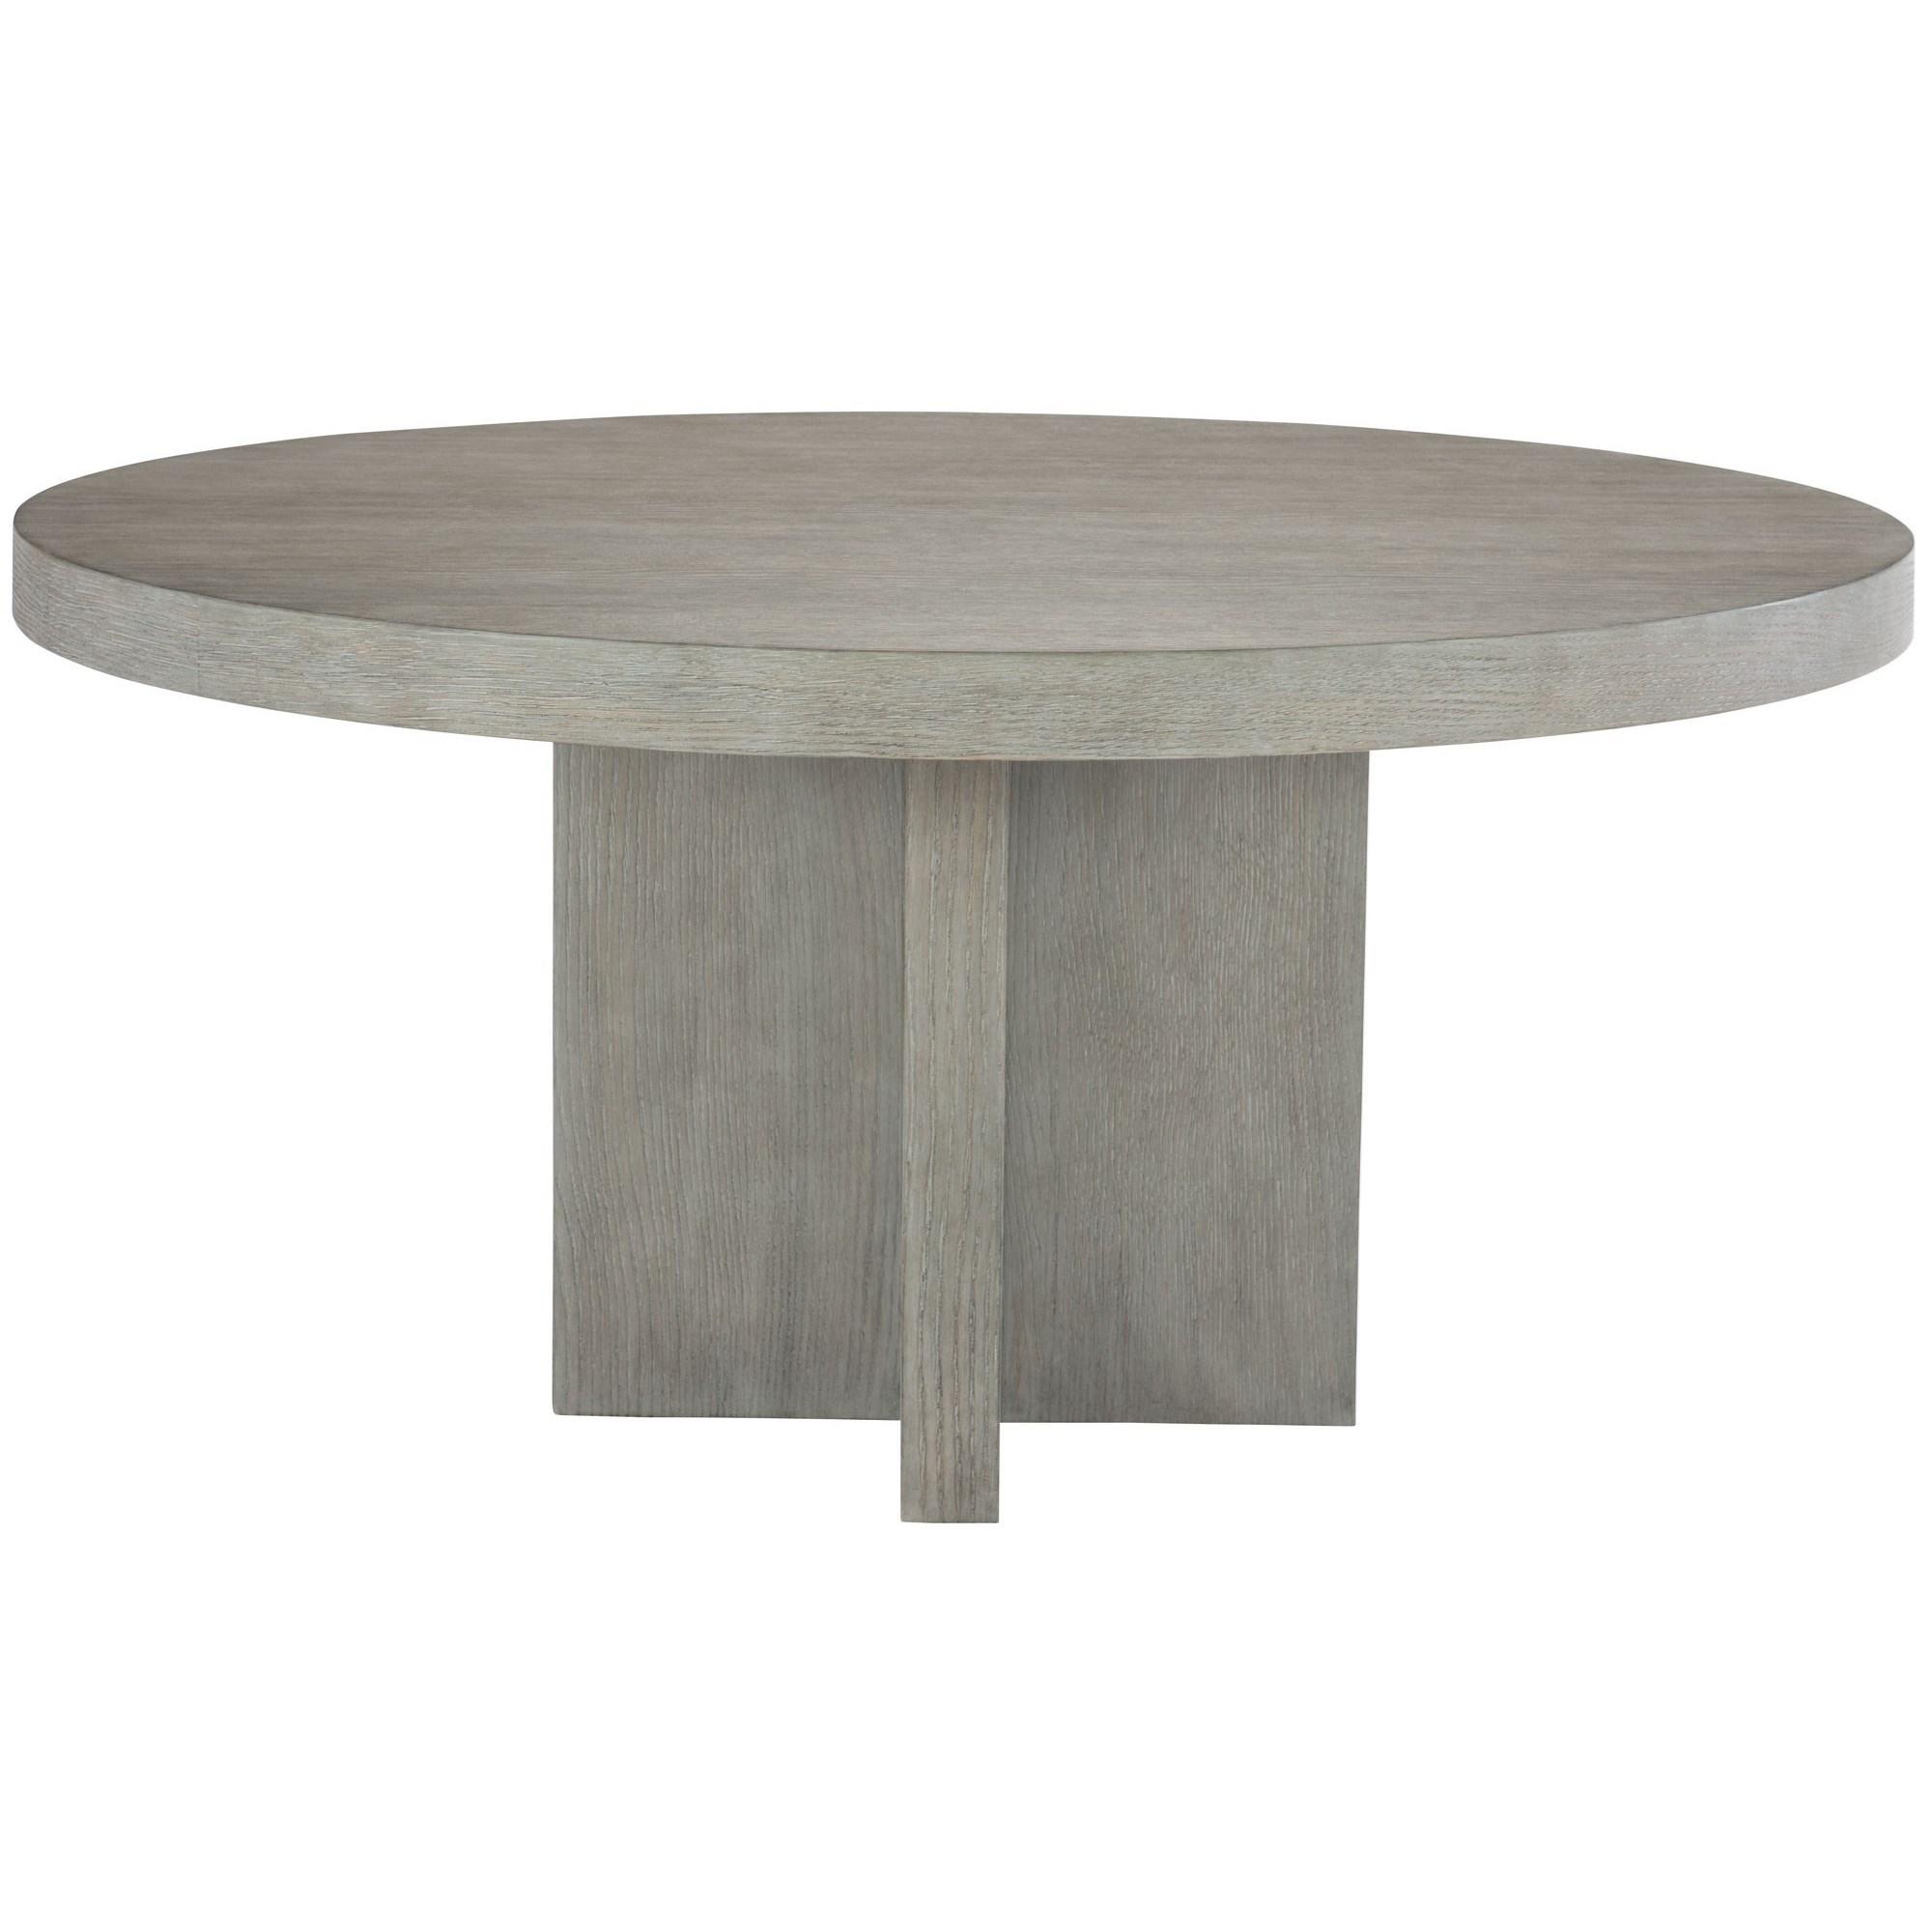 Interiors   Adler Contemporary Round Pedestal Dining Table By Bernhardt